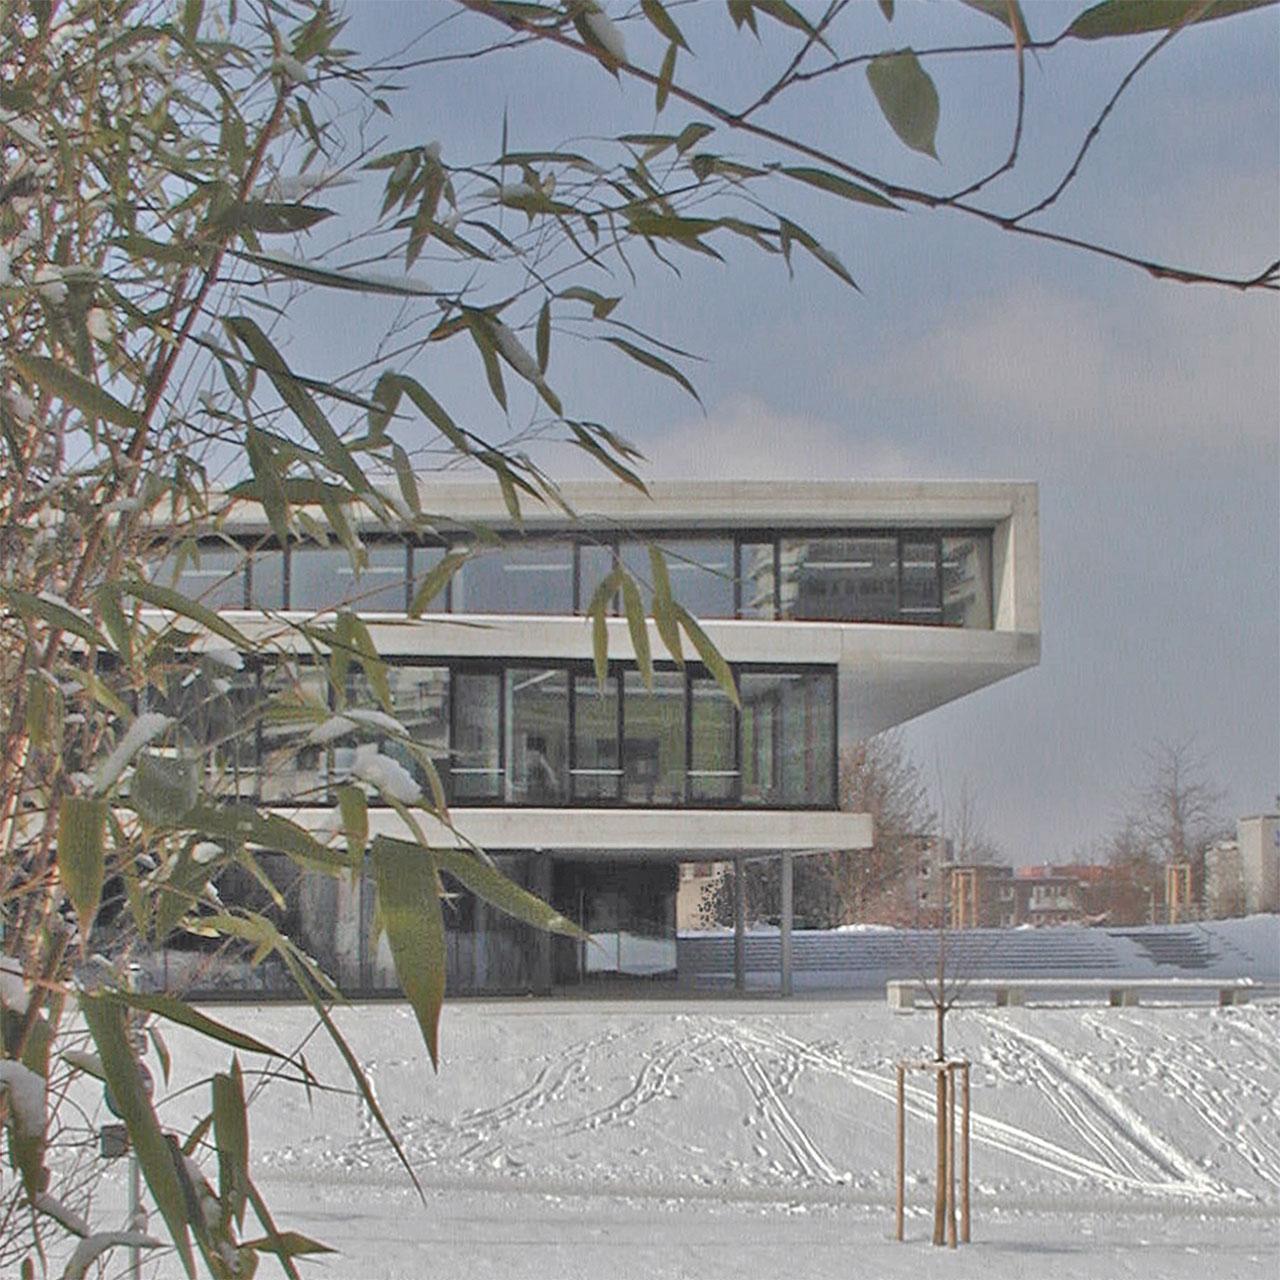 Neubau IZ Vaihingen, Fassadenausschnitt